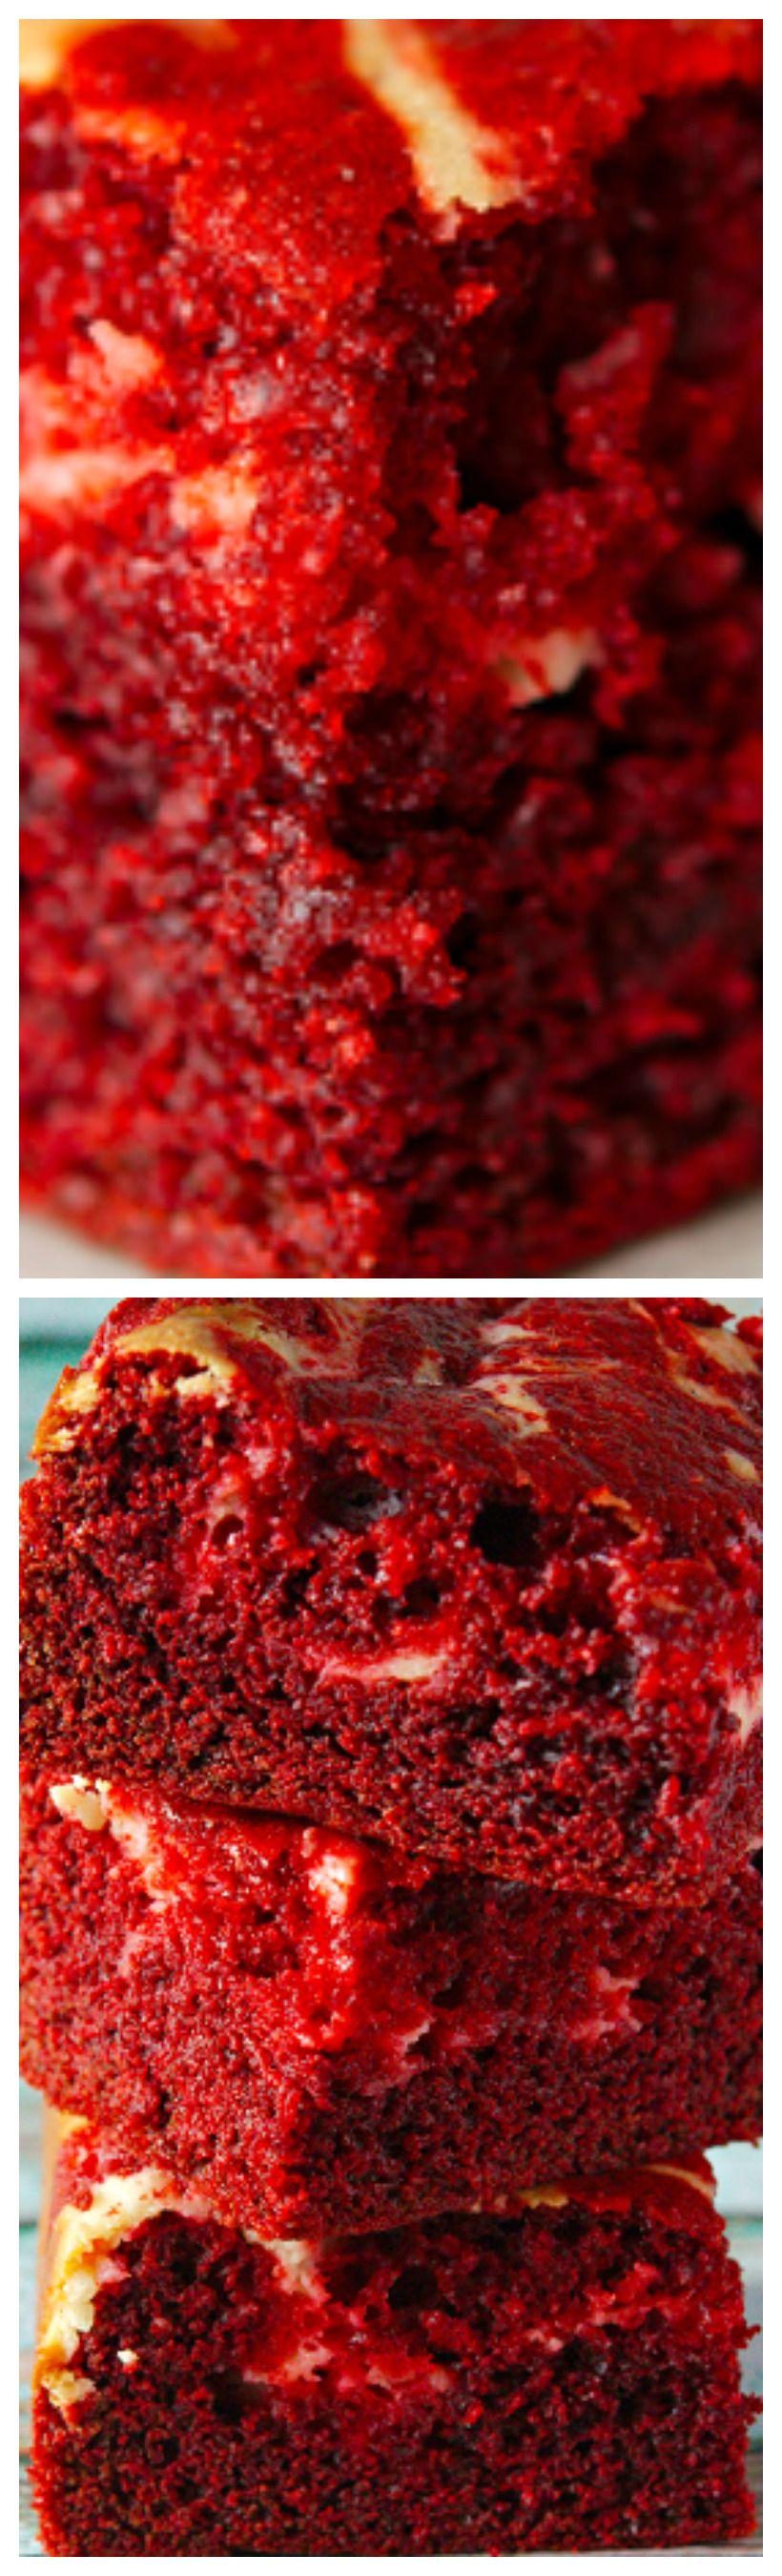 Red Velvet Cheesecake Brownie Recipe #redvelvetcheesecake